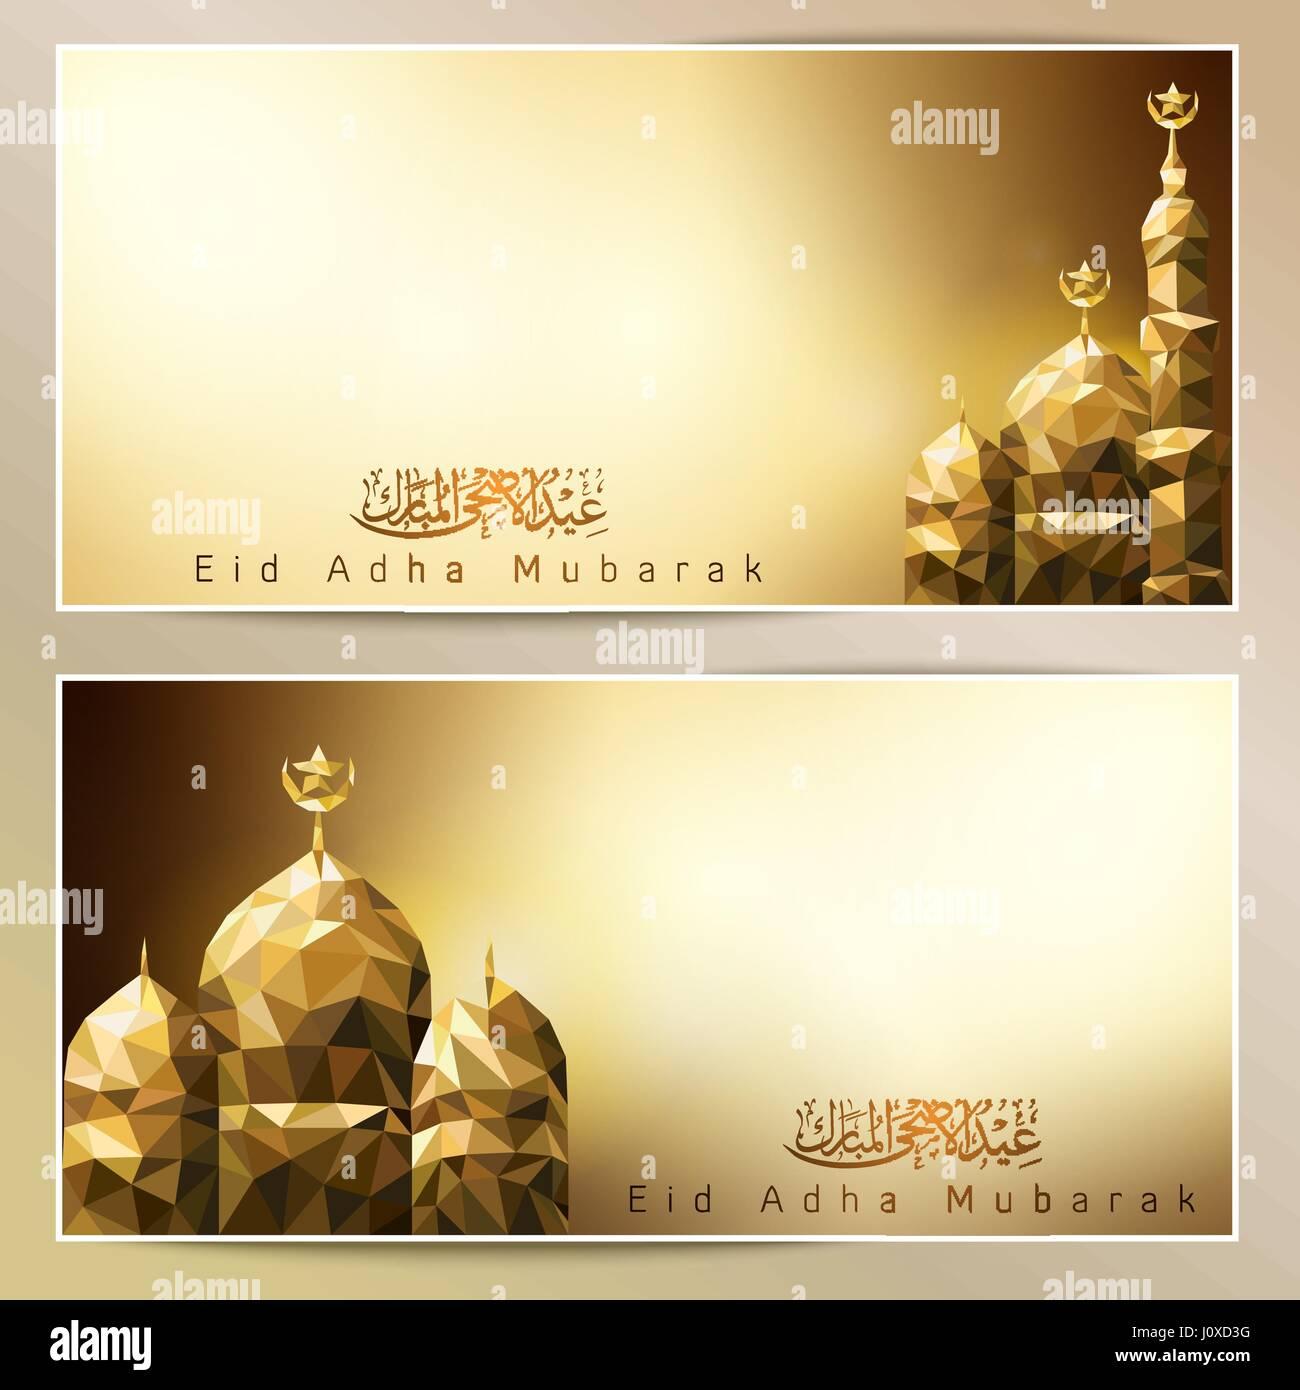 Eid adha mubarak islamic greeting template background stock vector eid adha mubarak islamic greeting template background m4hsunfo